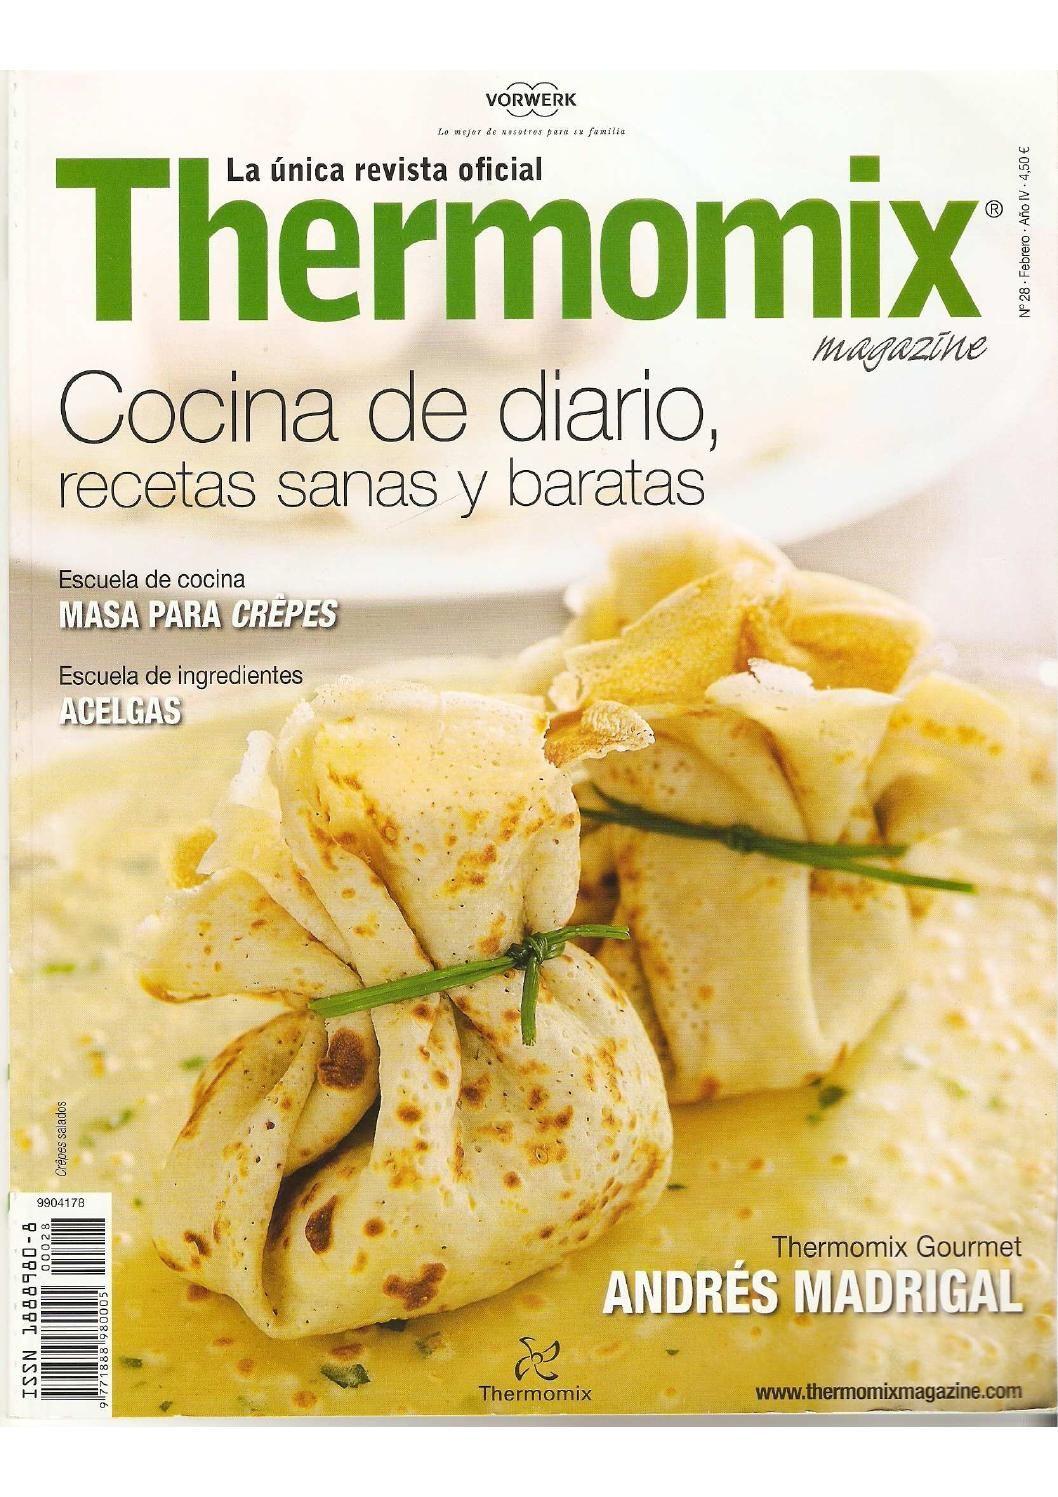 Revista Thermomix Nº28 Cocina De Diario Recetas Sanas Y Baratas Recetas De Cocina Sana Comida Comidas Diarias